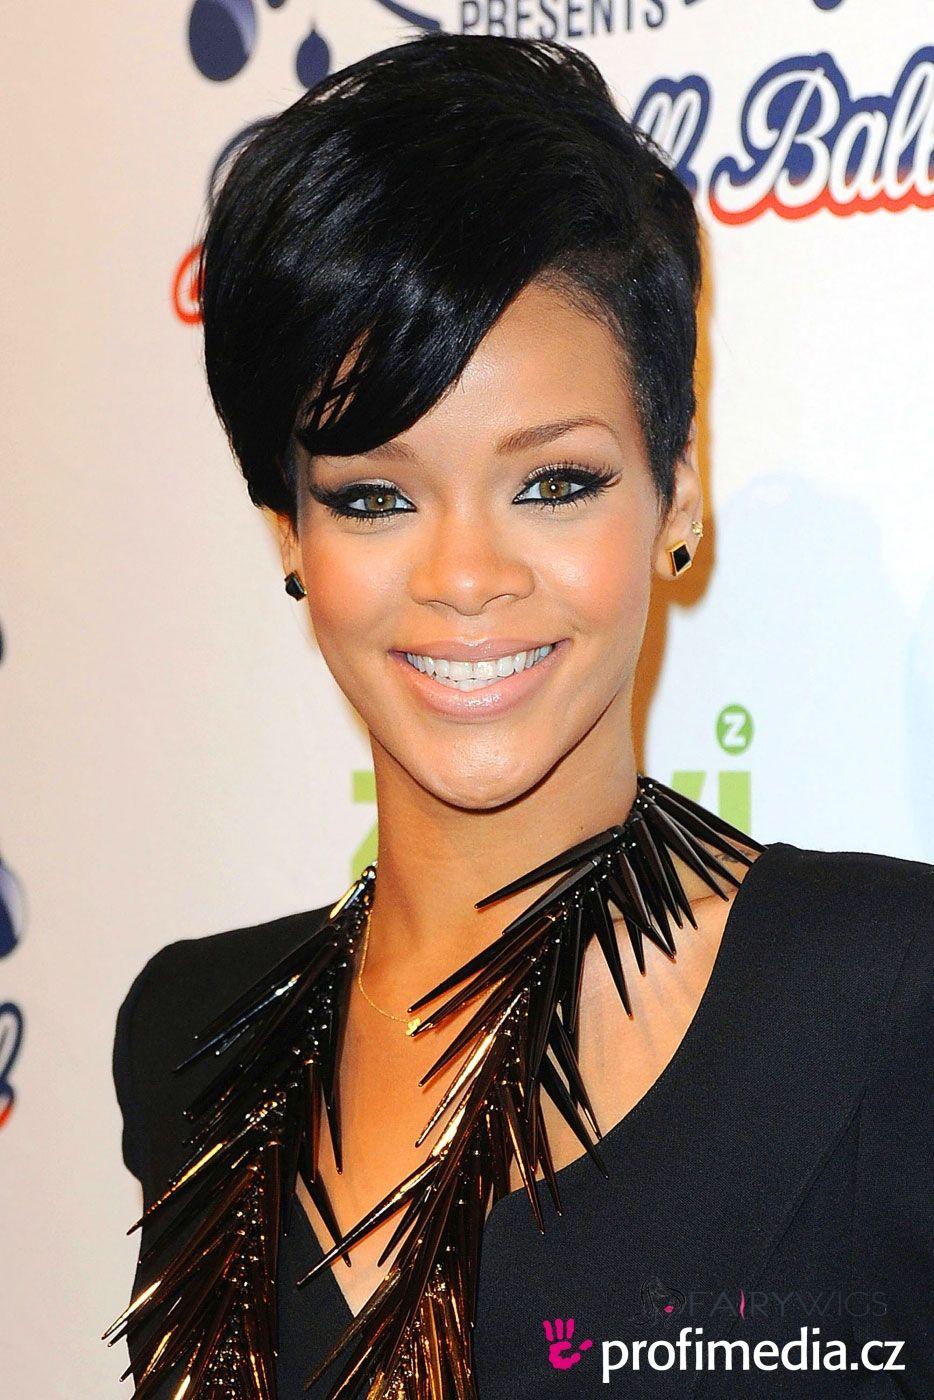 Stunning Short Black Female Celebrity Hairstyle : fairywigs.com ...